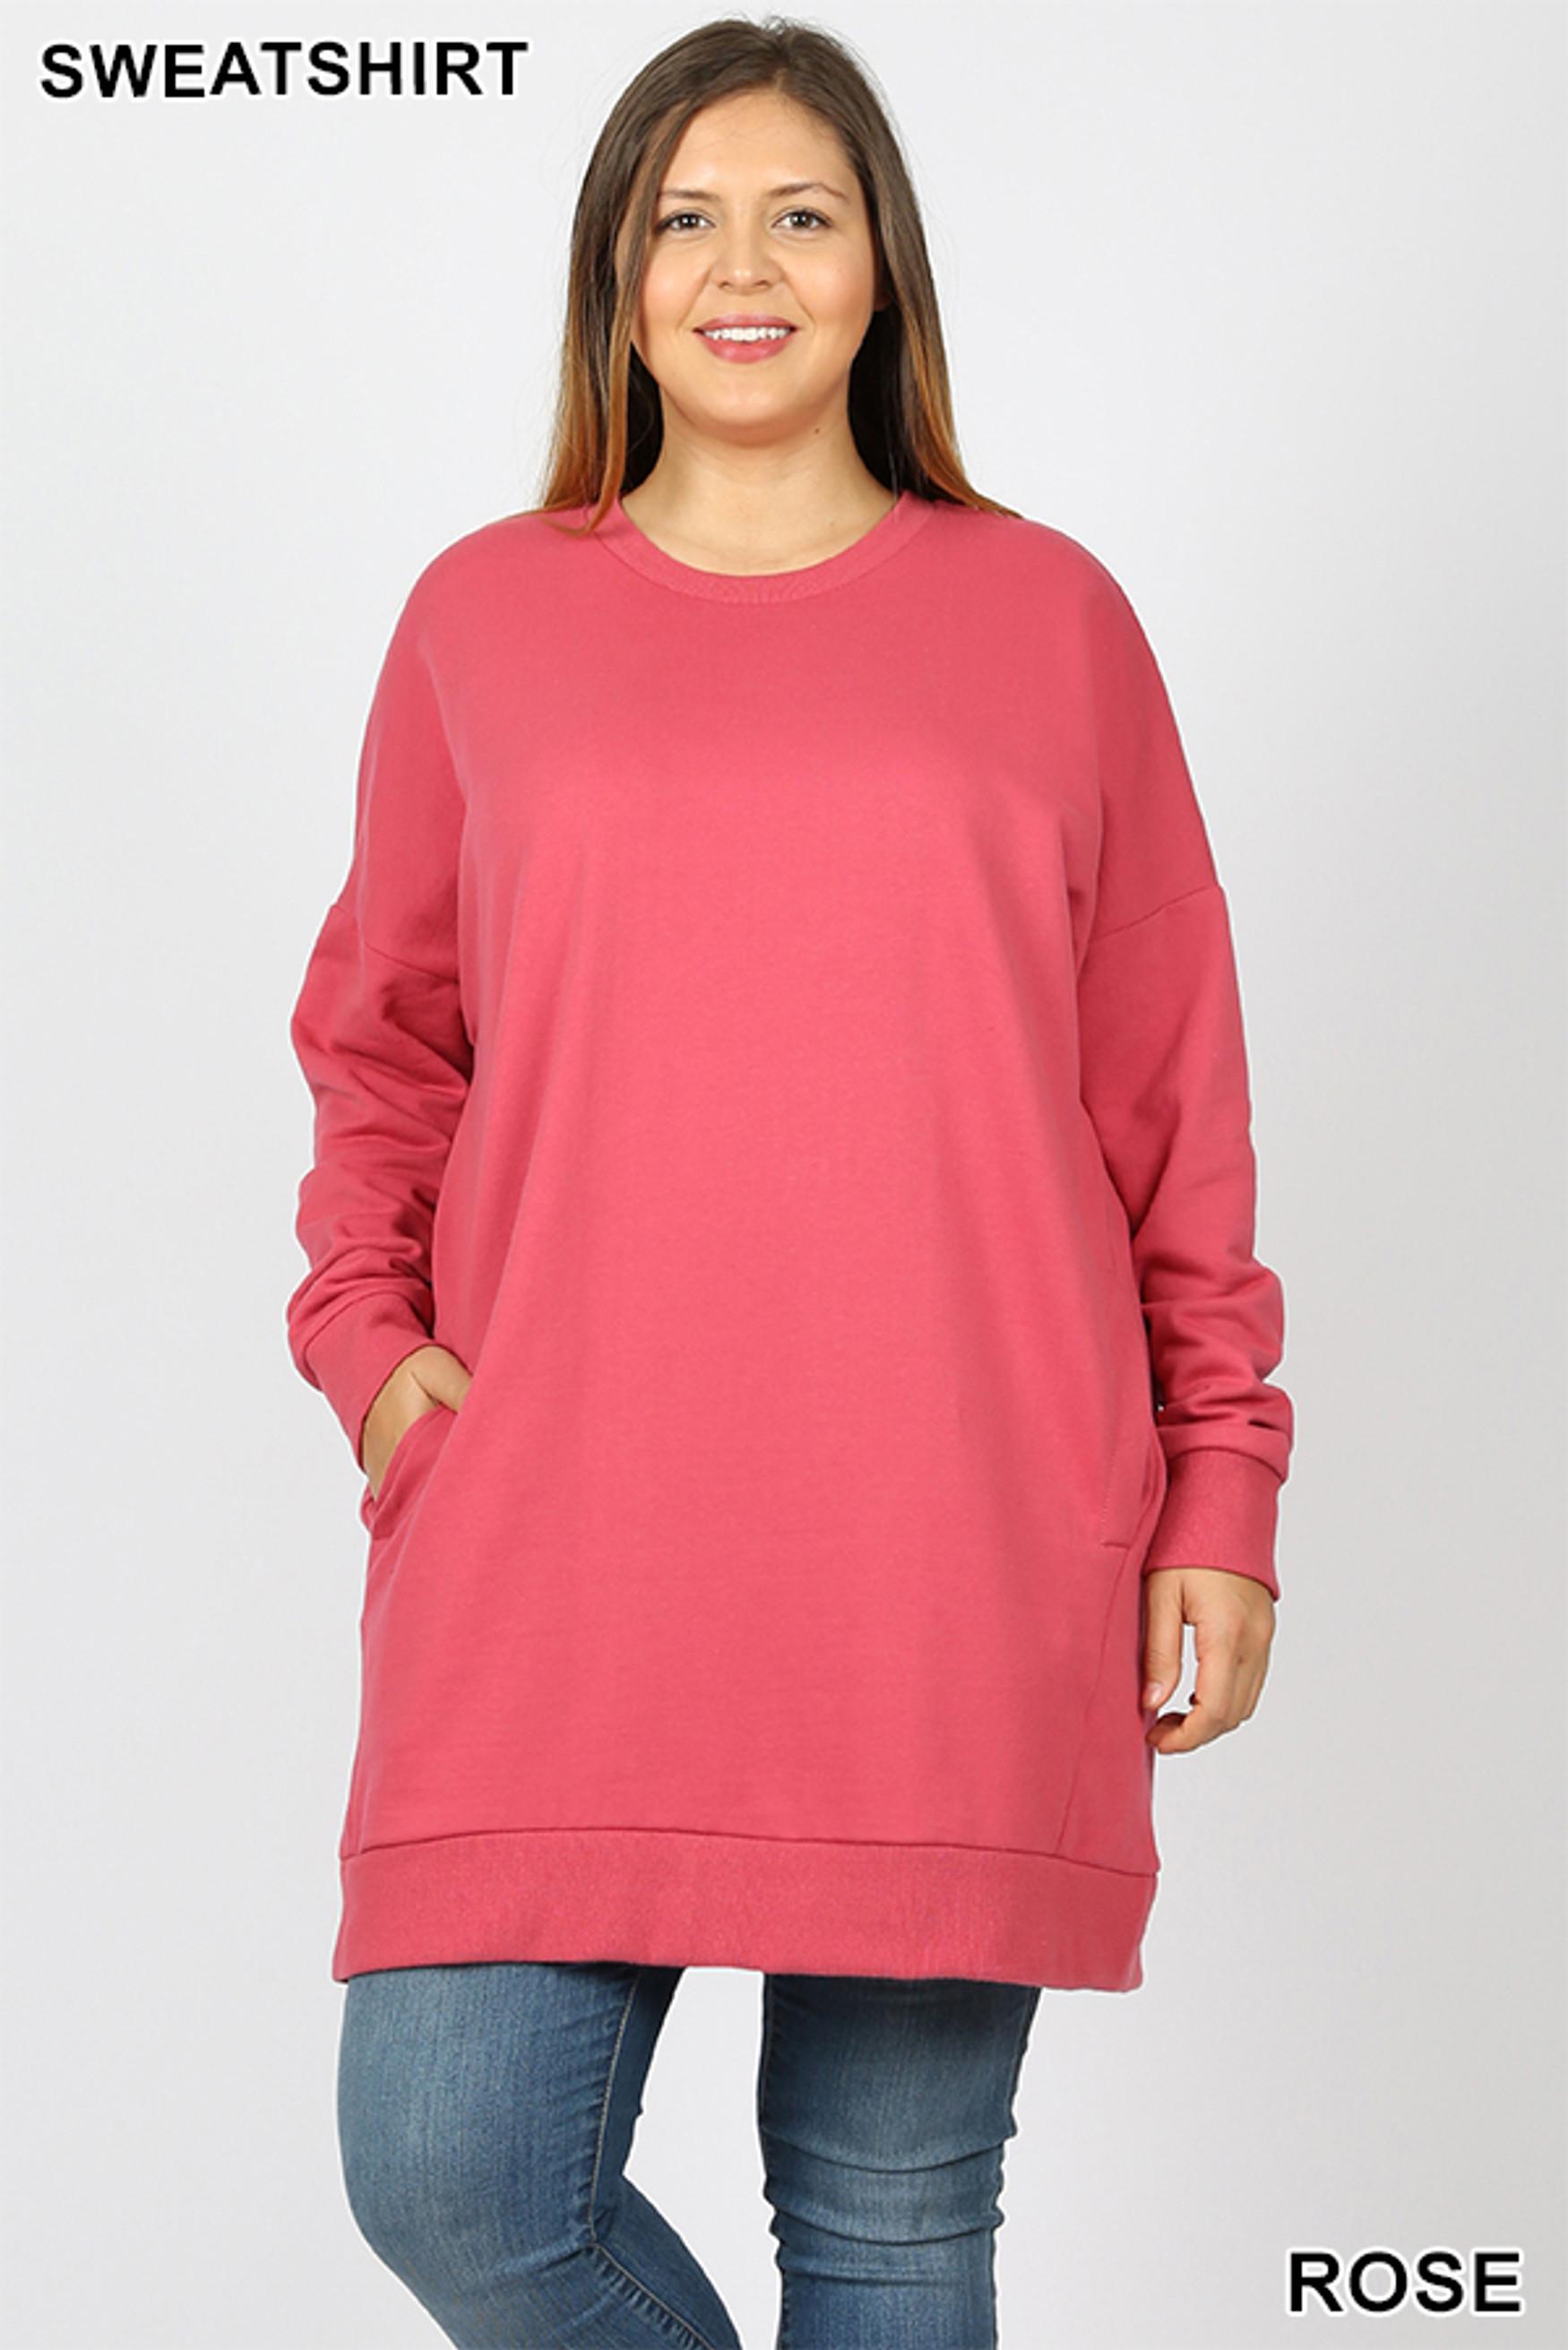 Oversized Round-Neck Plus Size Fleece Lined Sweatshirt with Pockets